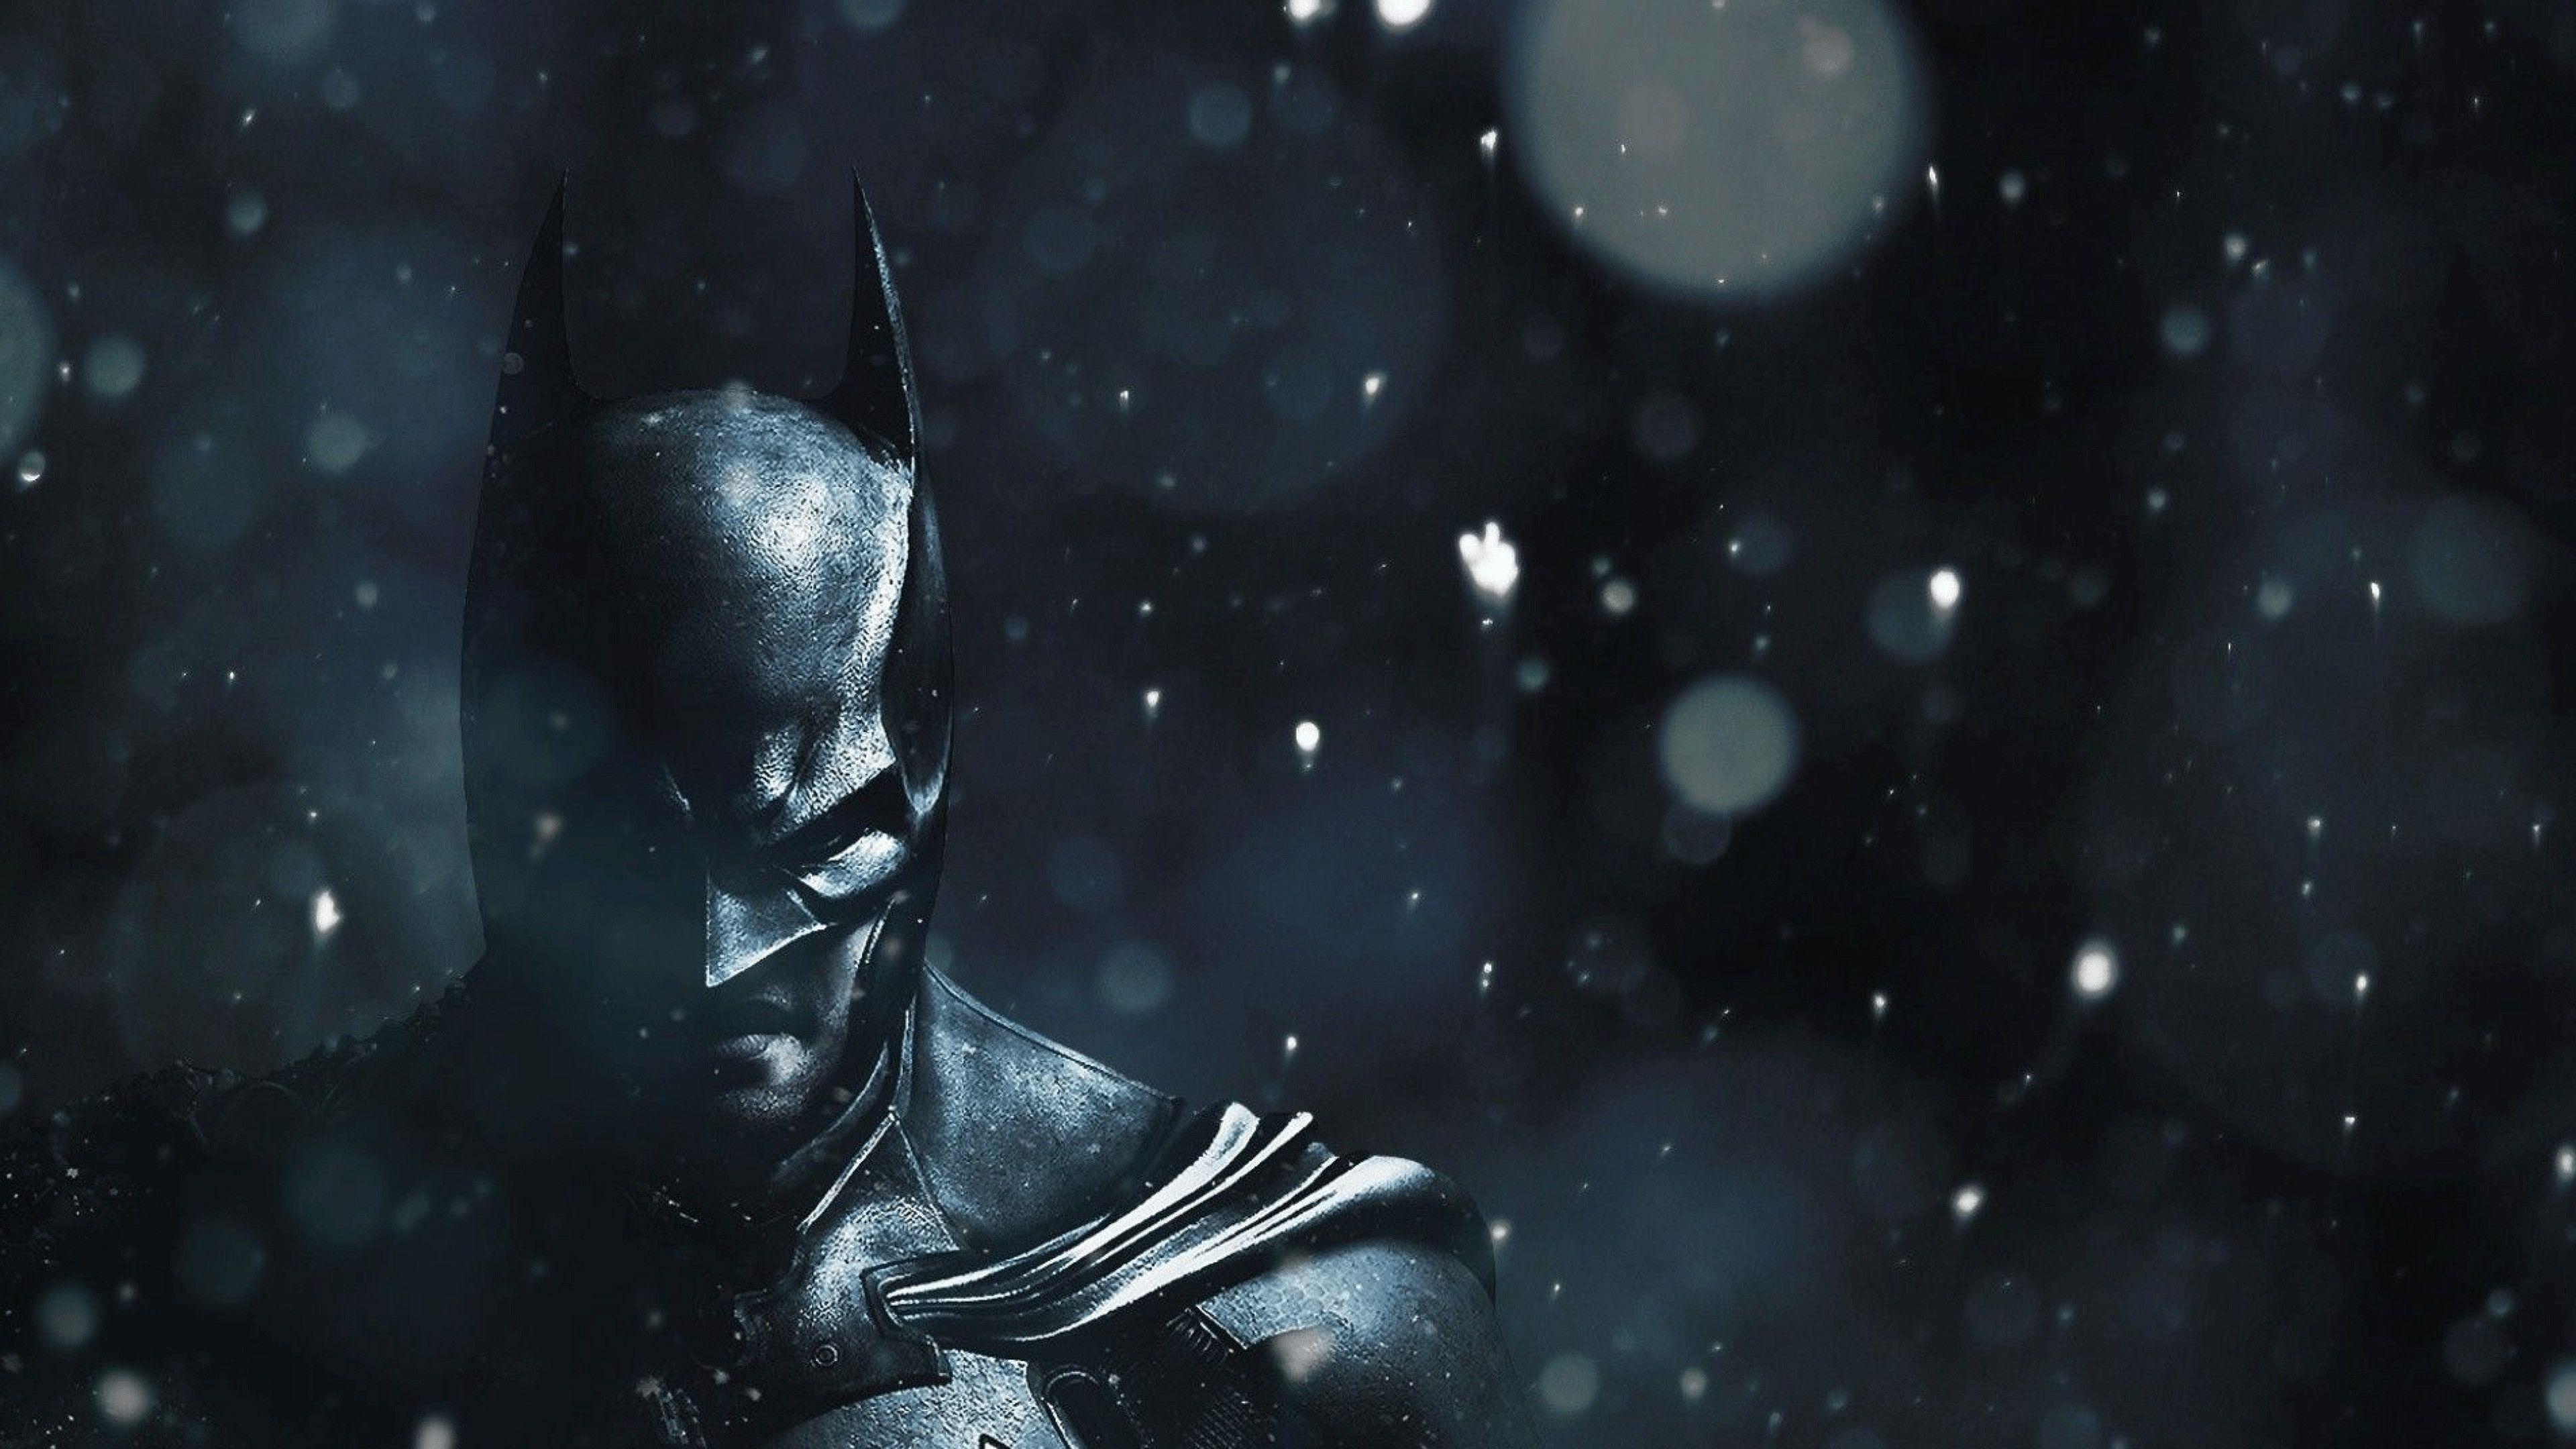 4k Batman Wallpaper Wallpapers 2020 Check More At Https